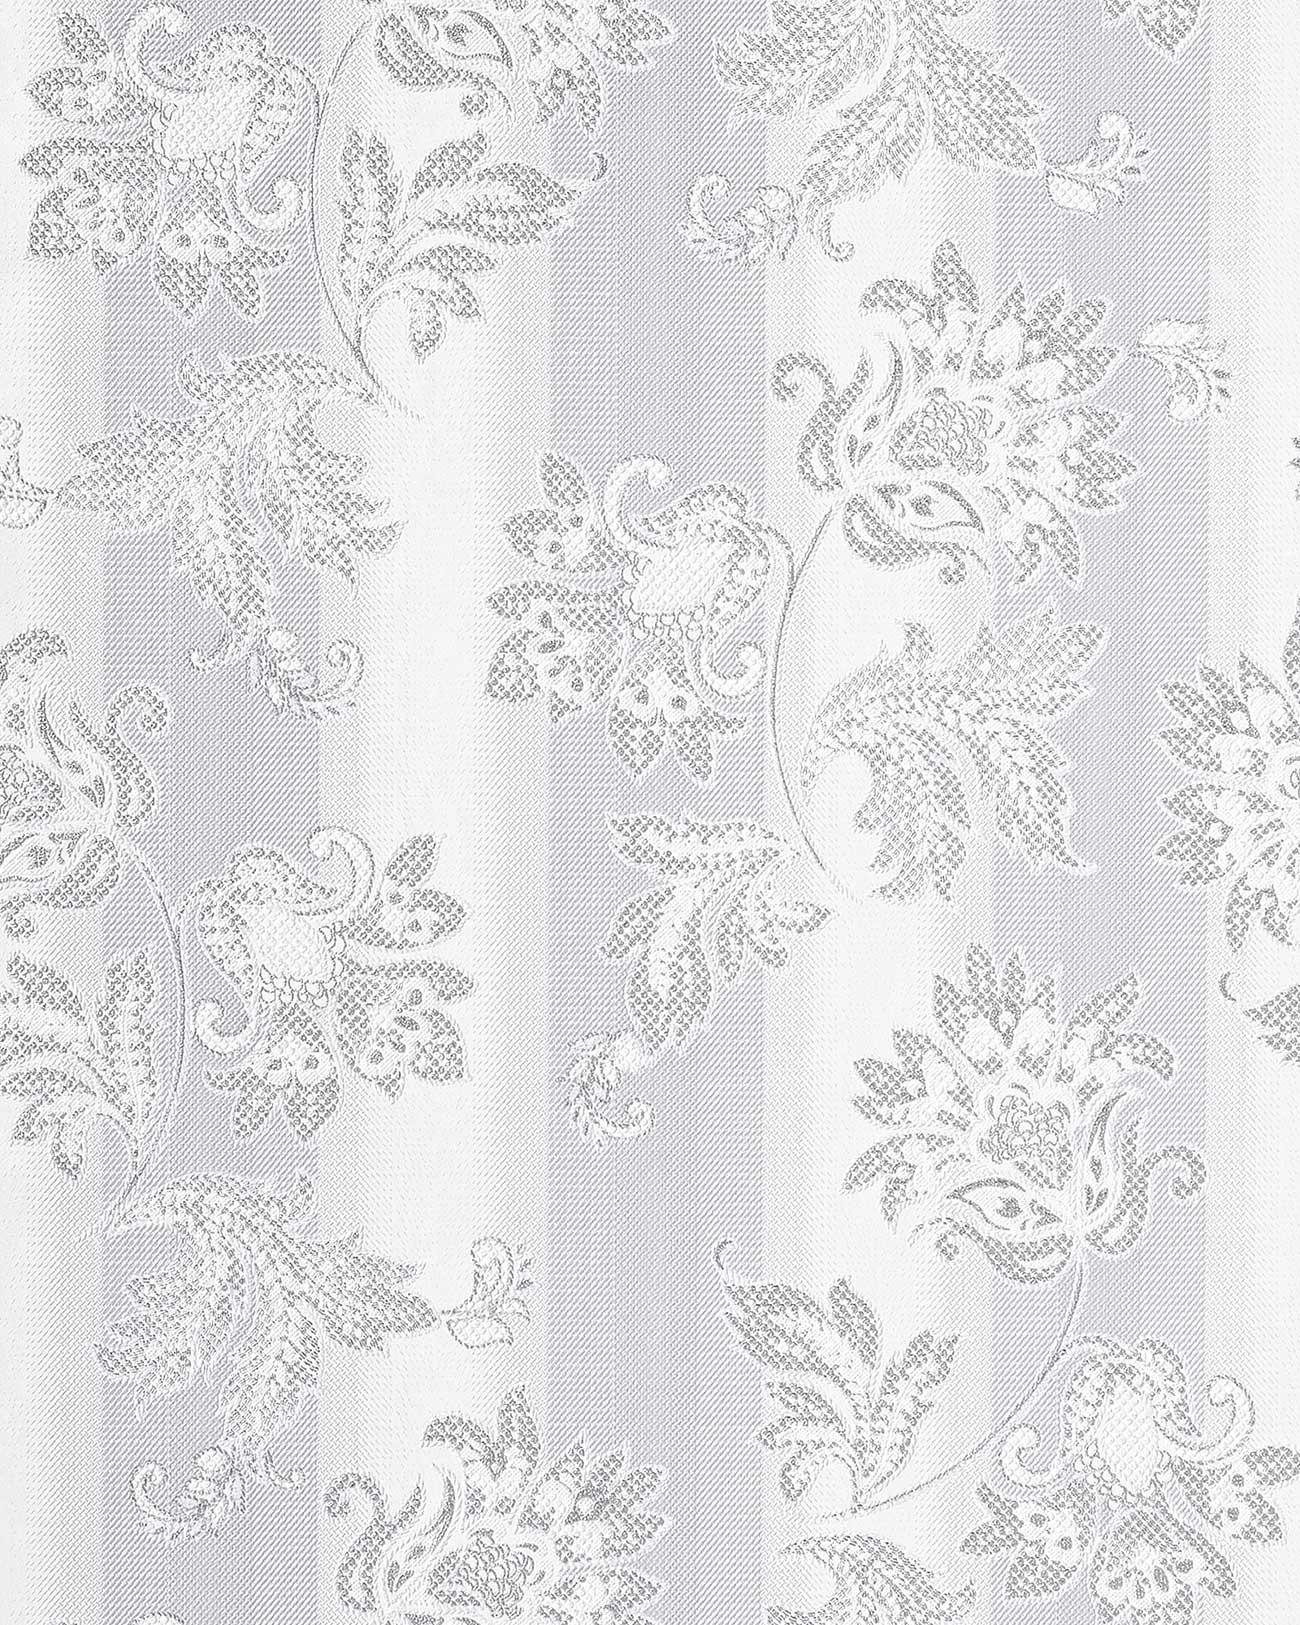 Bloemen behang structuur vinylbehang edem 084 20 design for Papel de pared plata